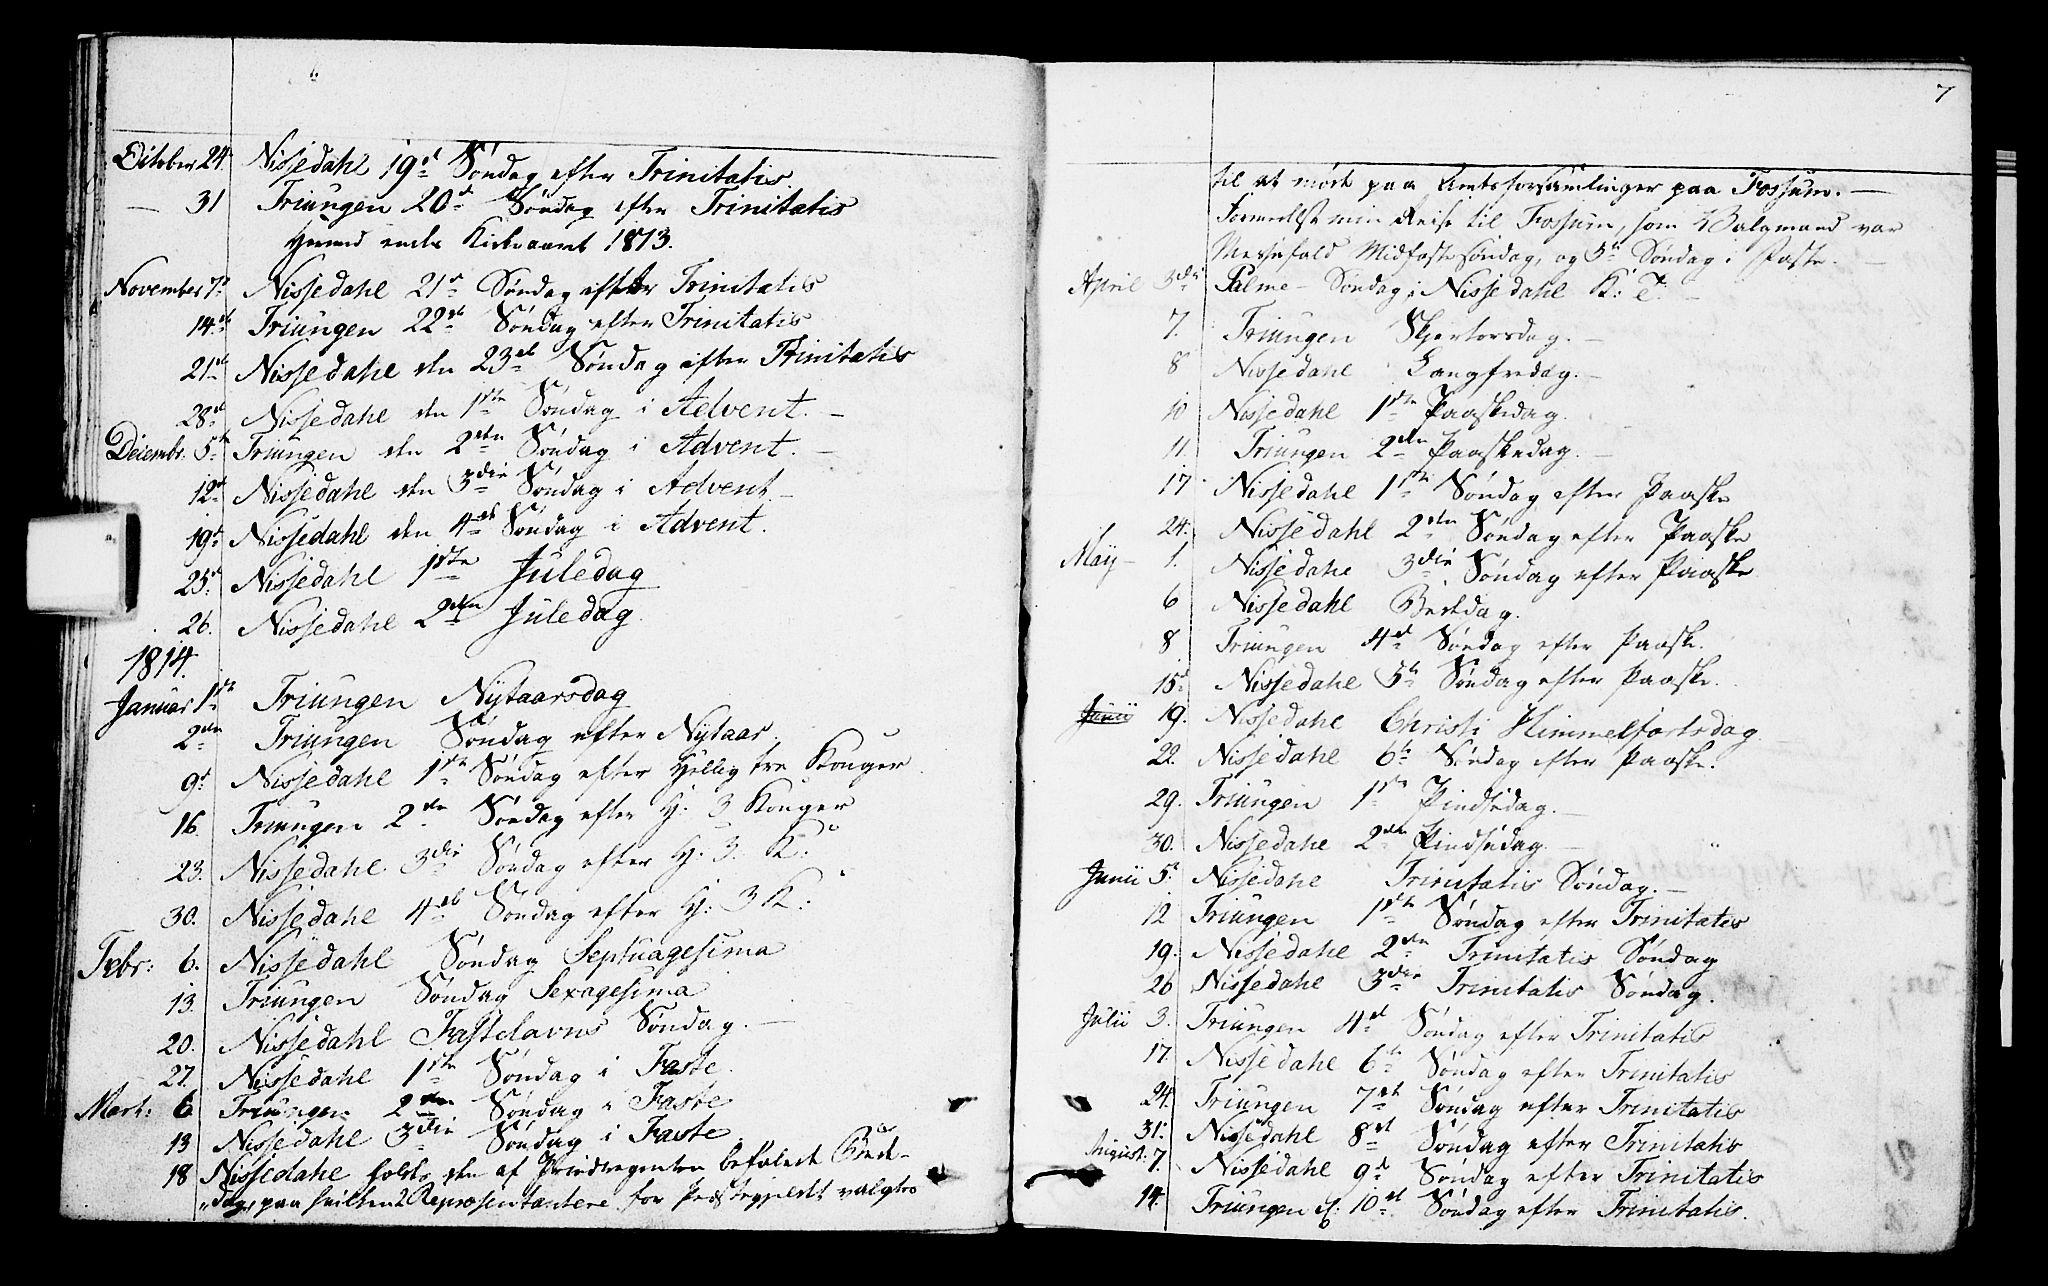 SAKO, Nissedal kirkebøker, F/Fa/L0001: Ministerialbok nr. I 1, 1811-1814, s. 7